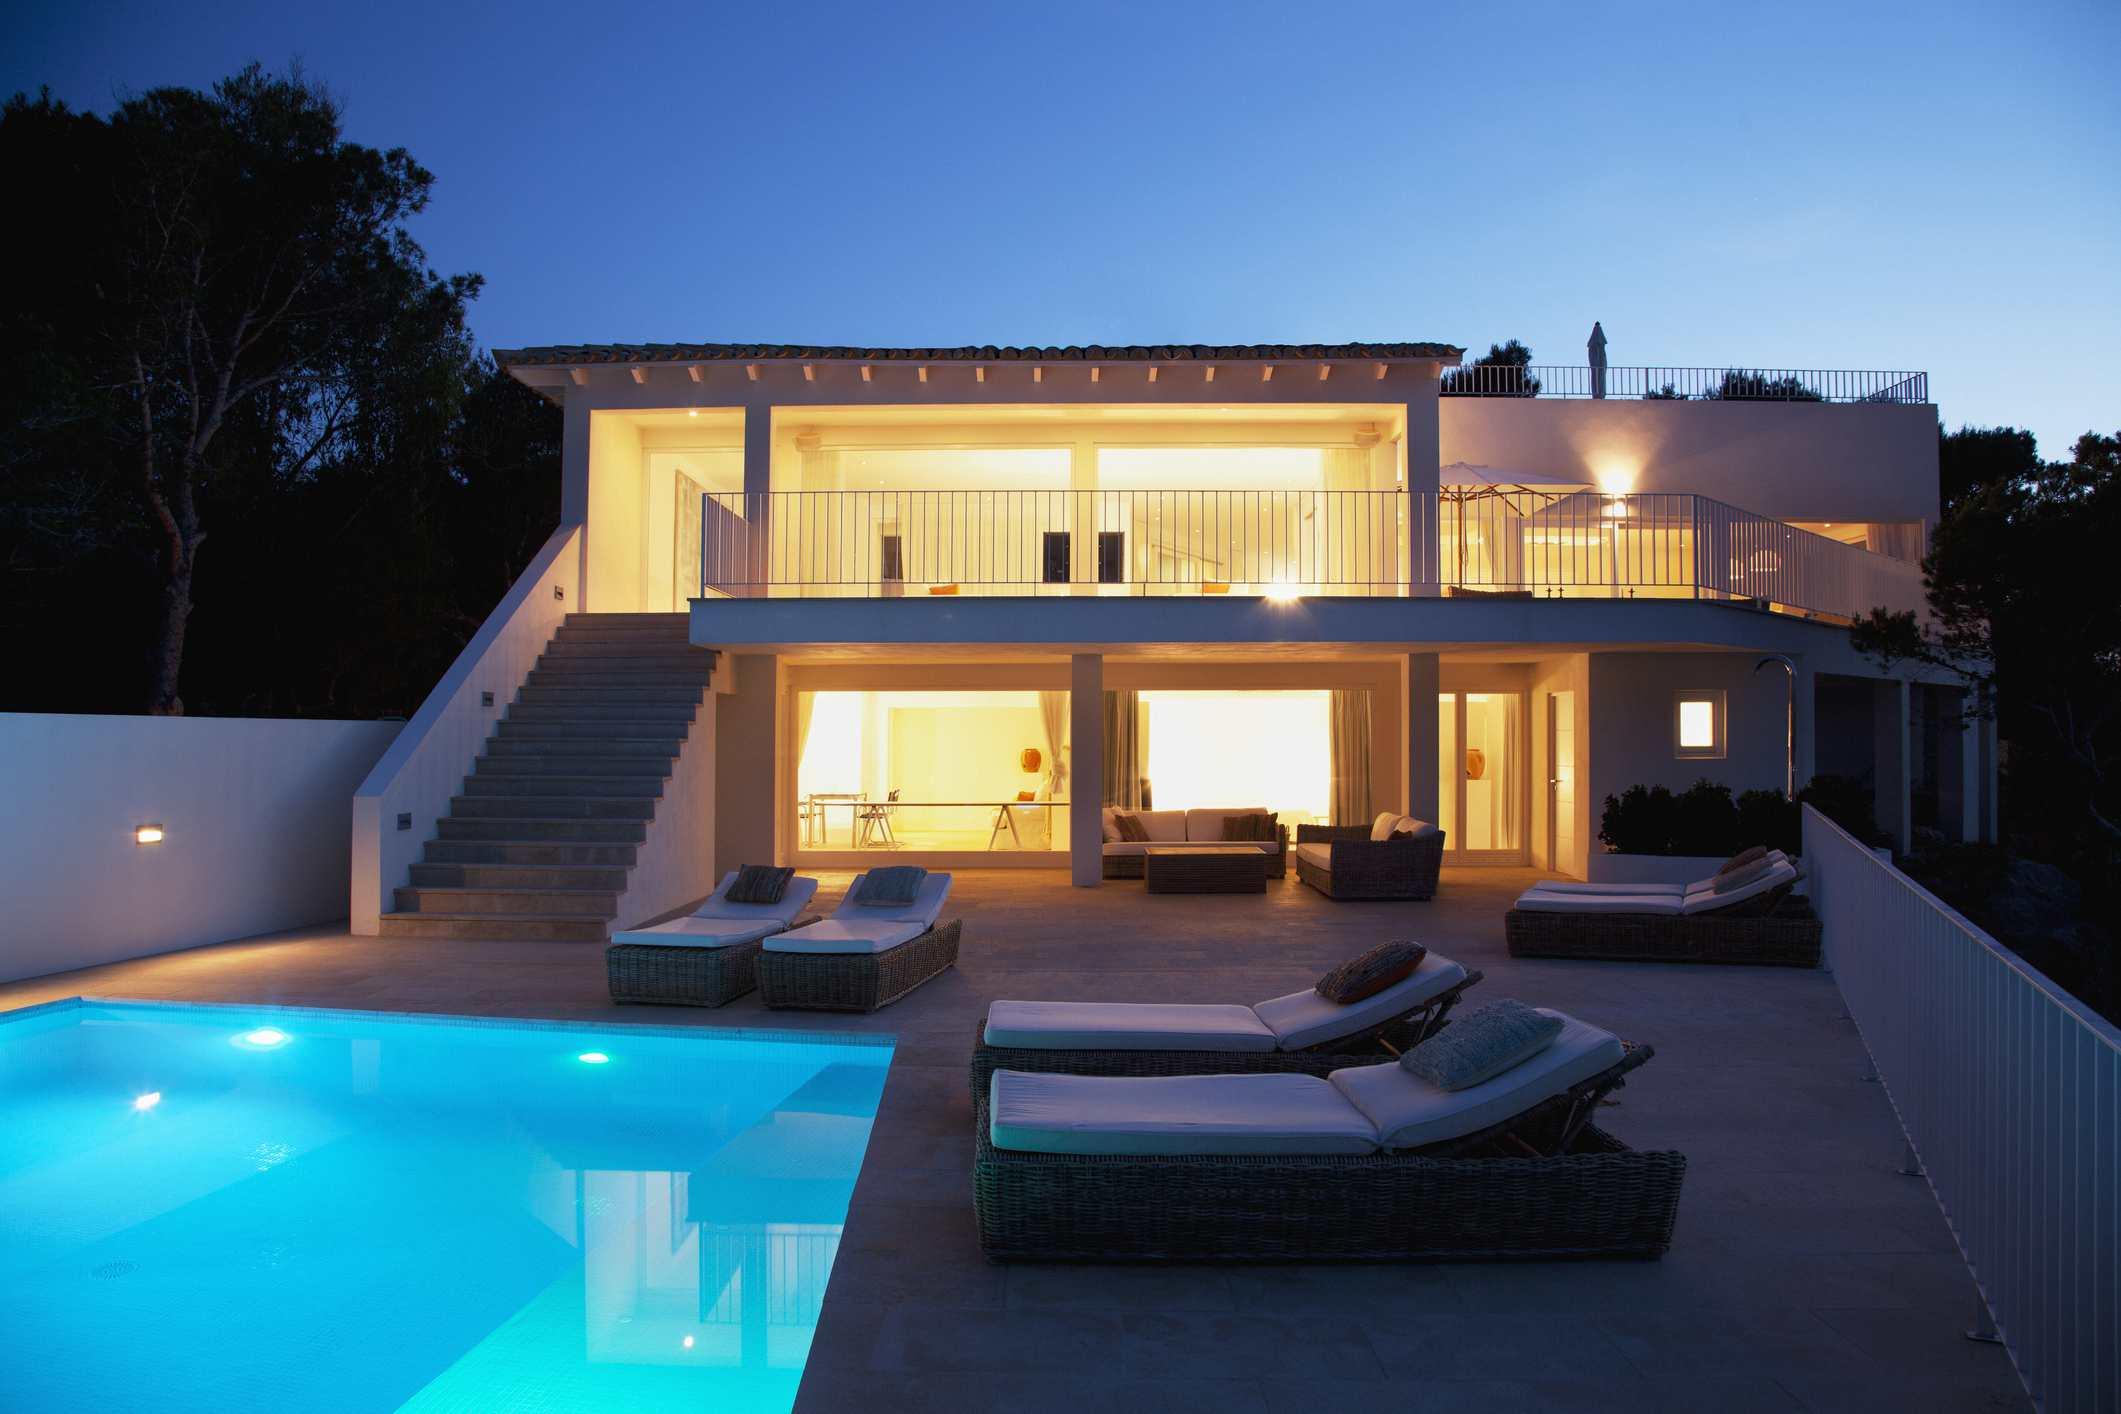 Una sal piscina de agua por la noche con una casa iluminada cerca